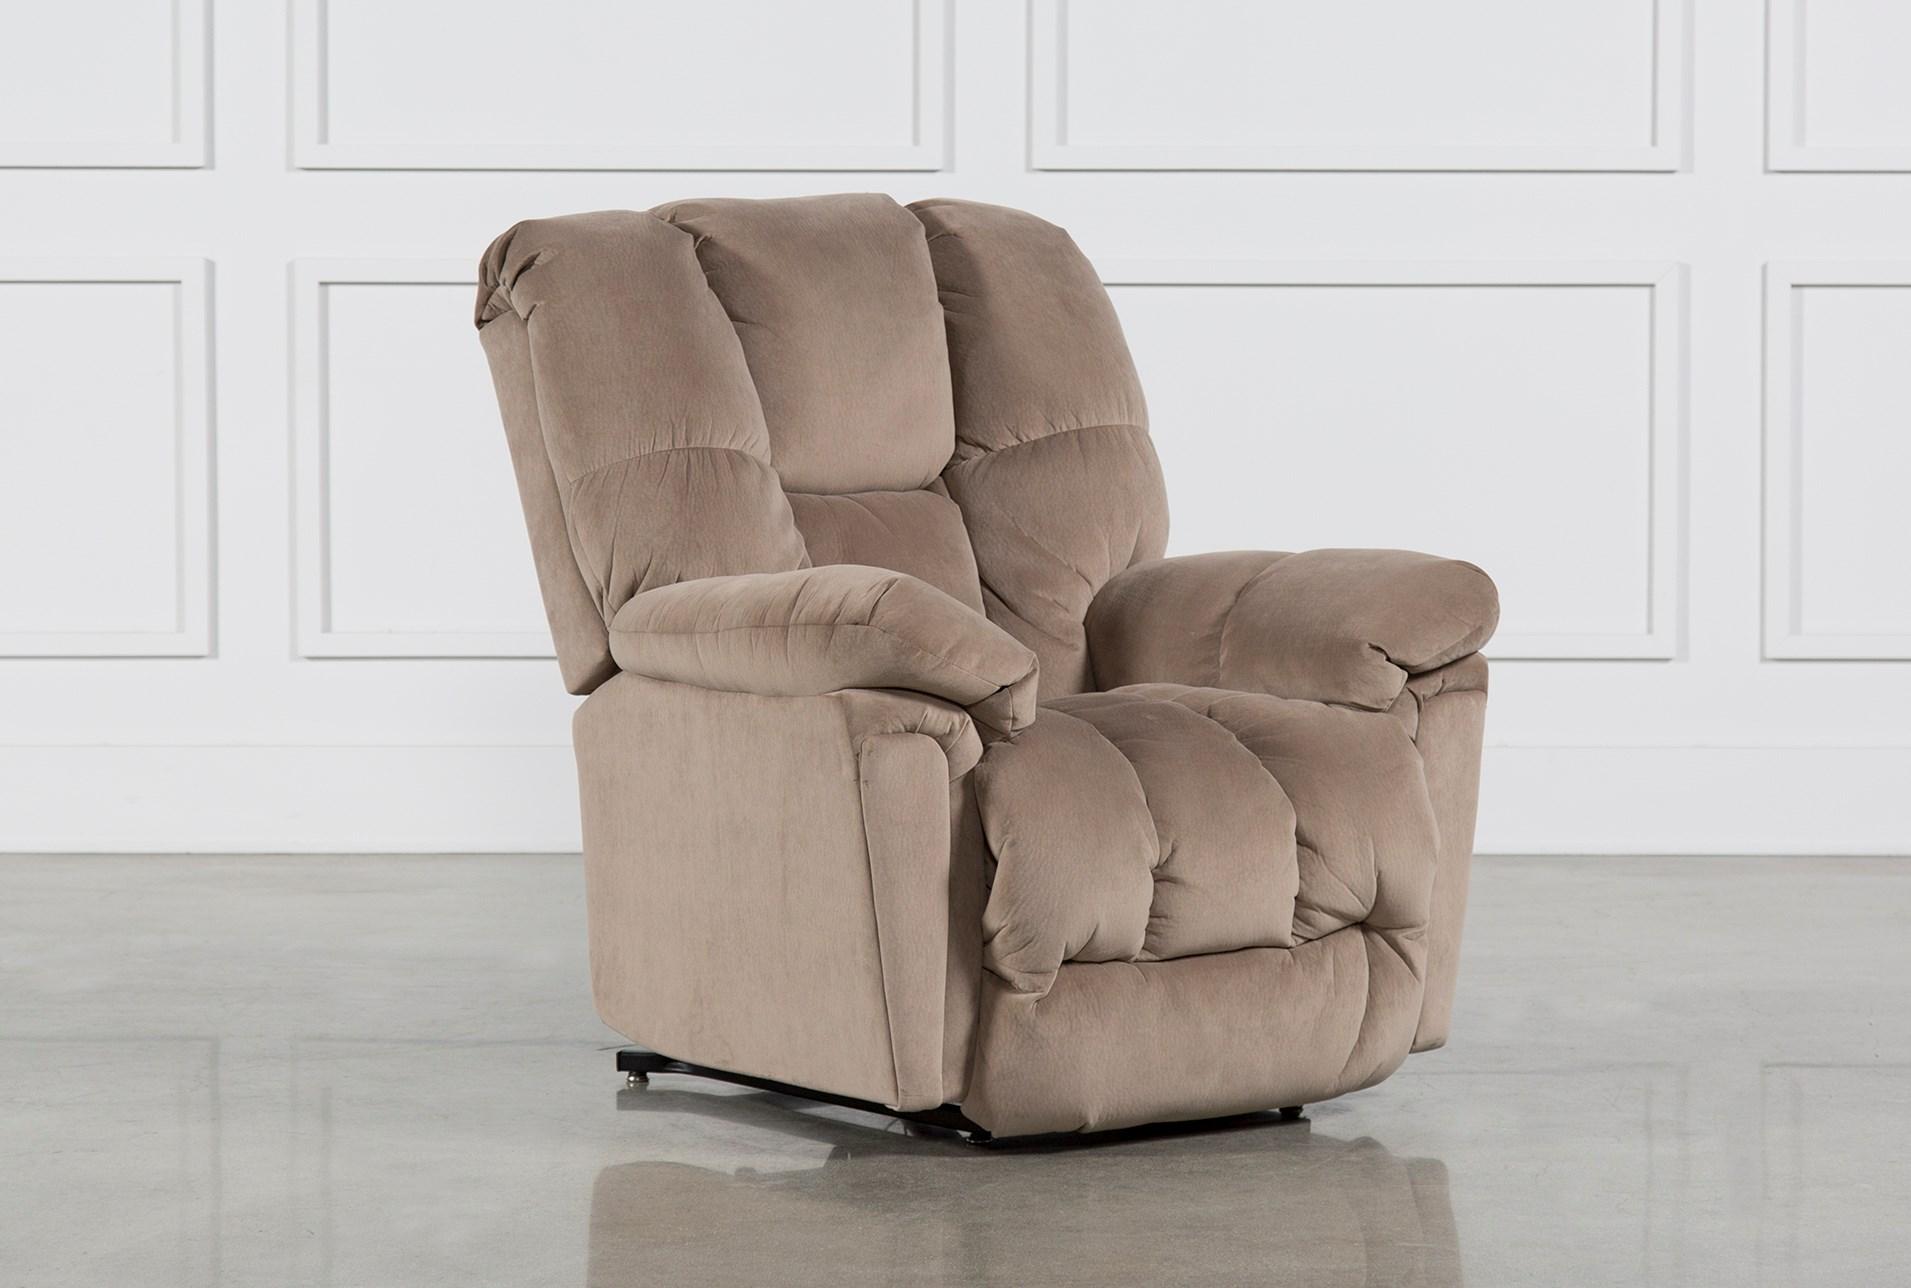 lunch office reclining green recliner series ergonomic break merax dp com amazon kitchen chair home mesh